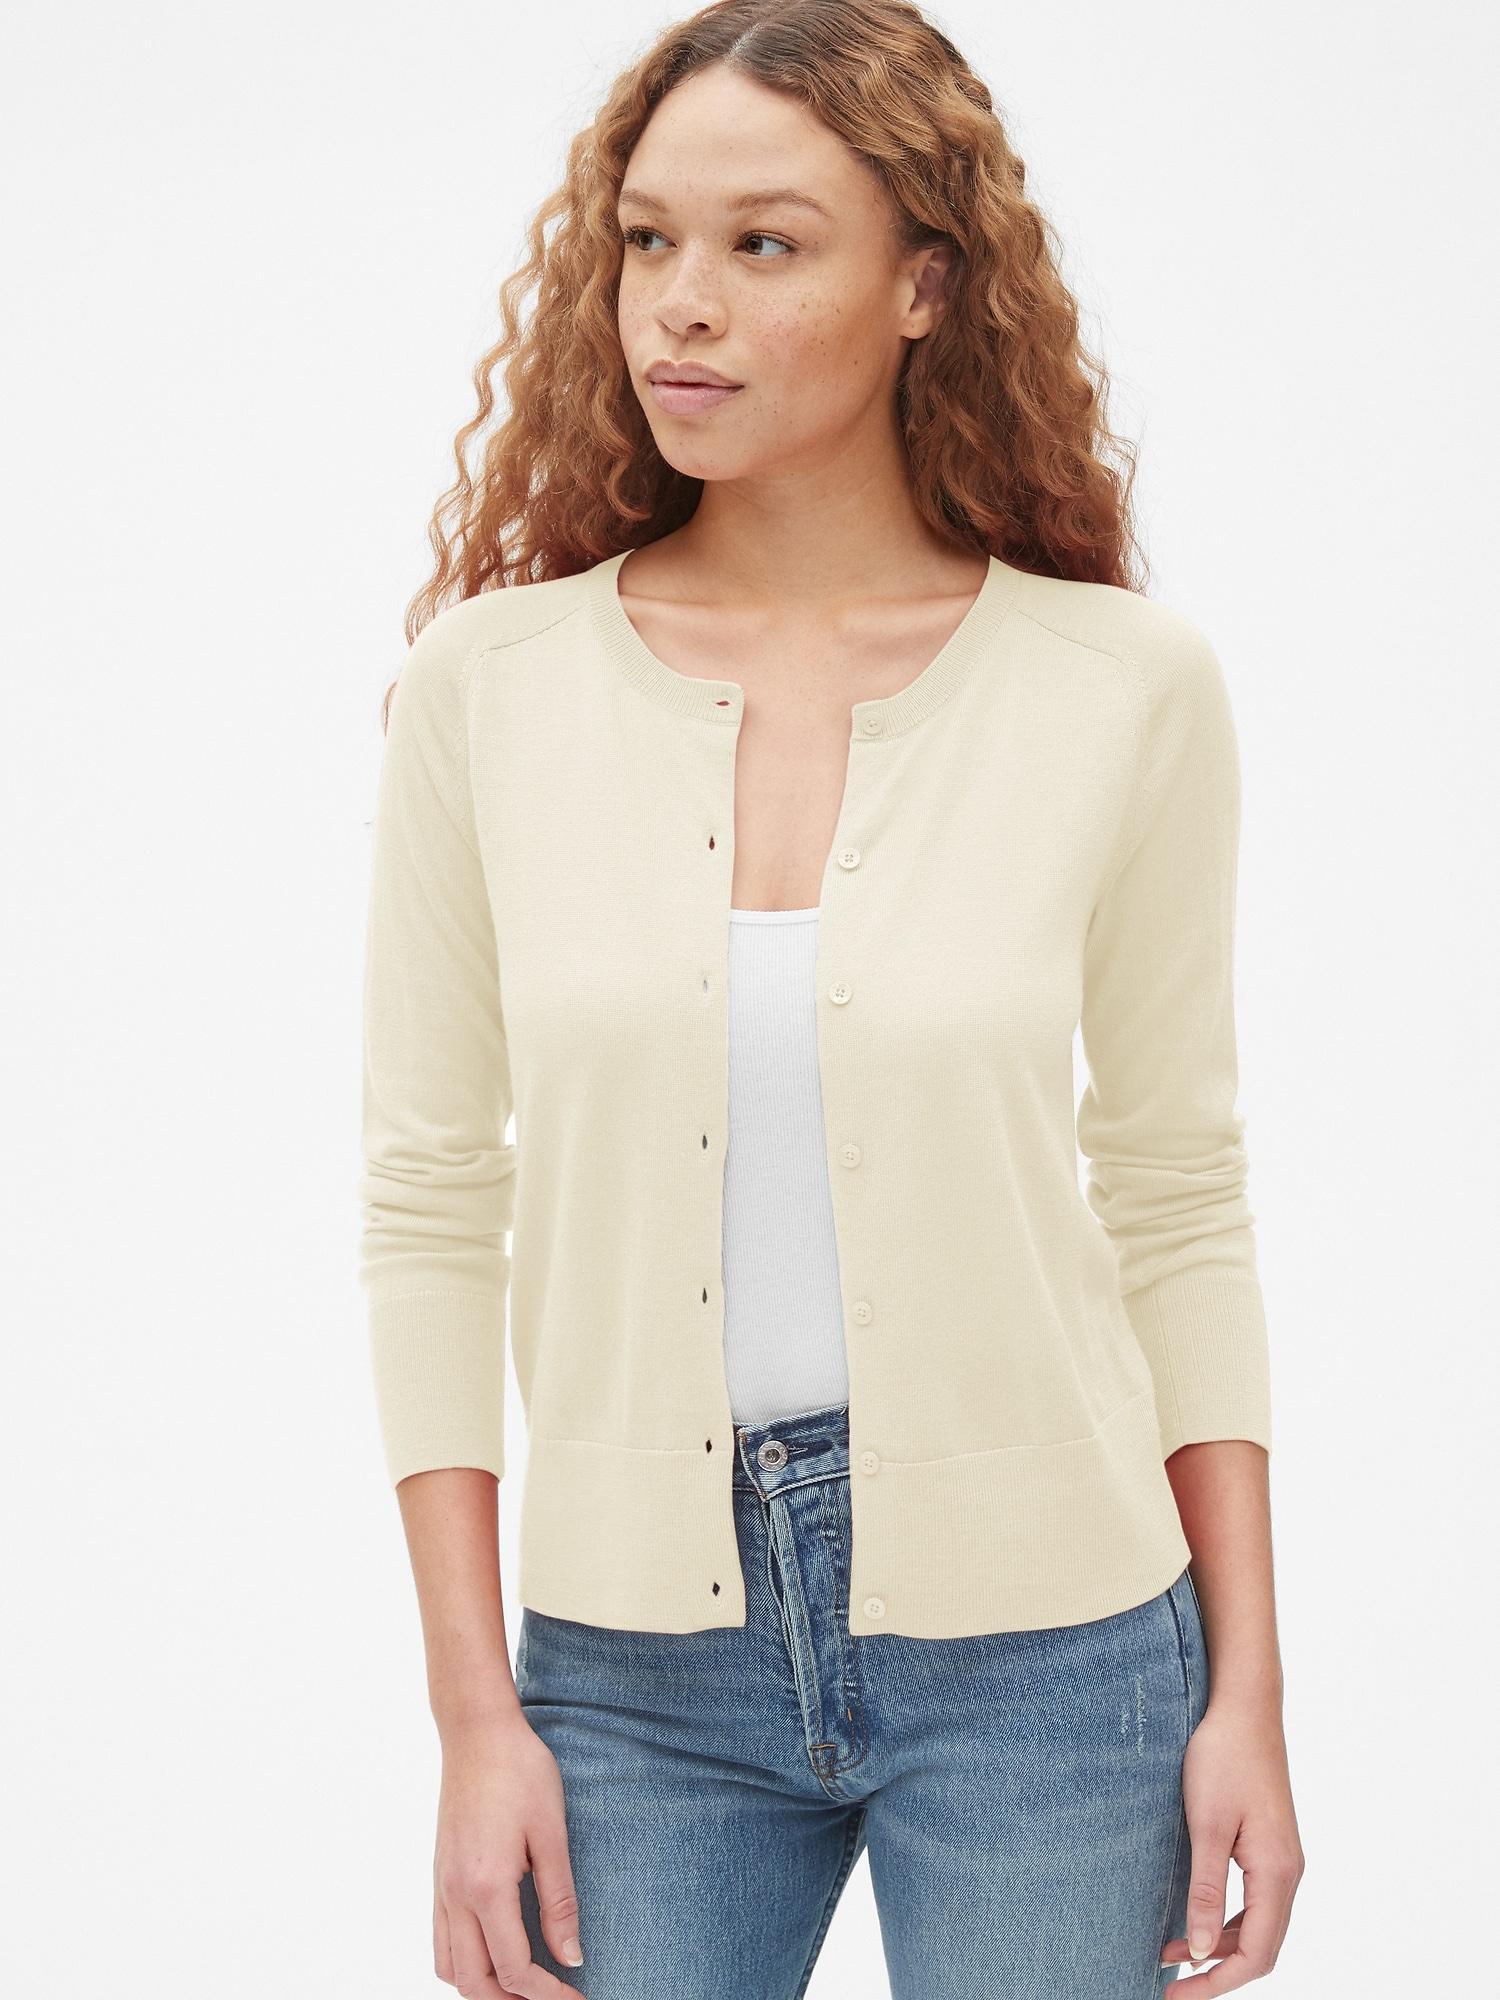 5e46b60d2d Lyst - Gap Crewneck Cardigan Sweater In Merino Wool in White